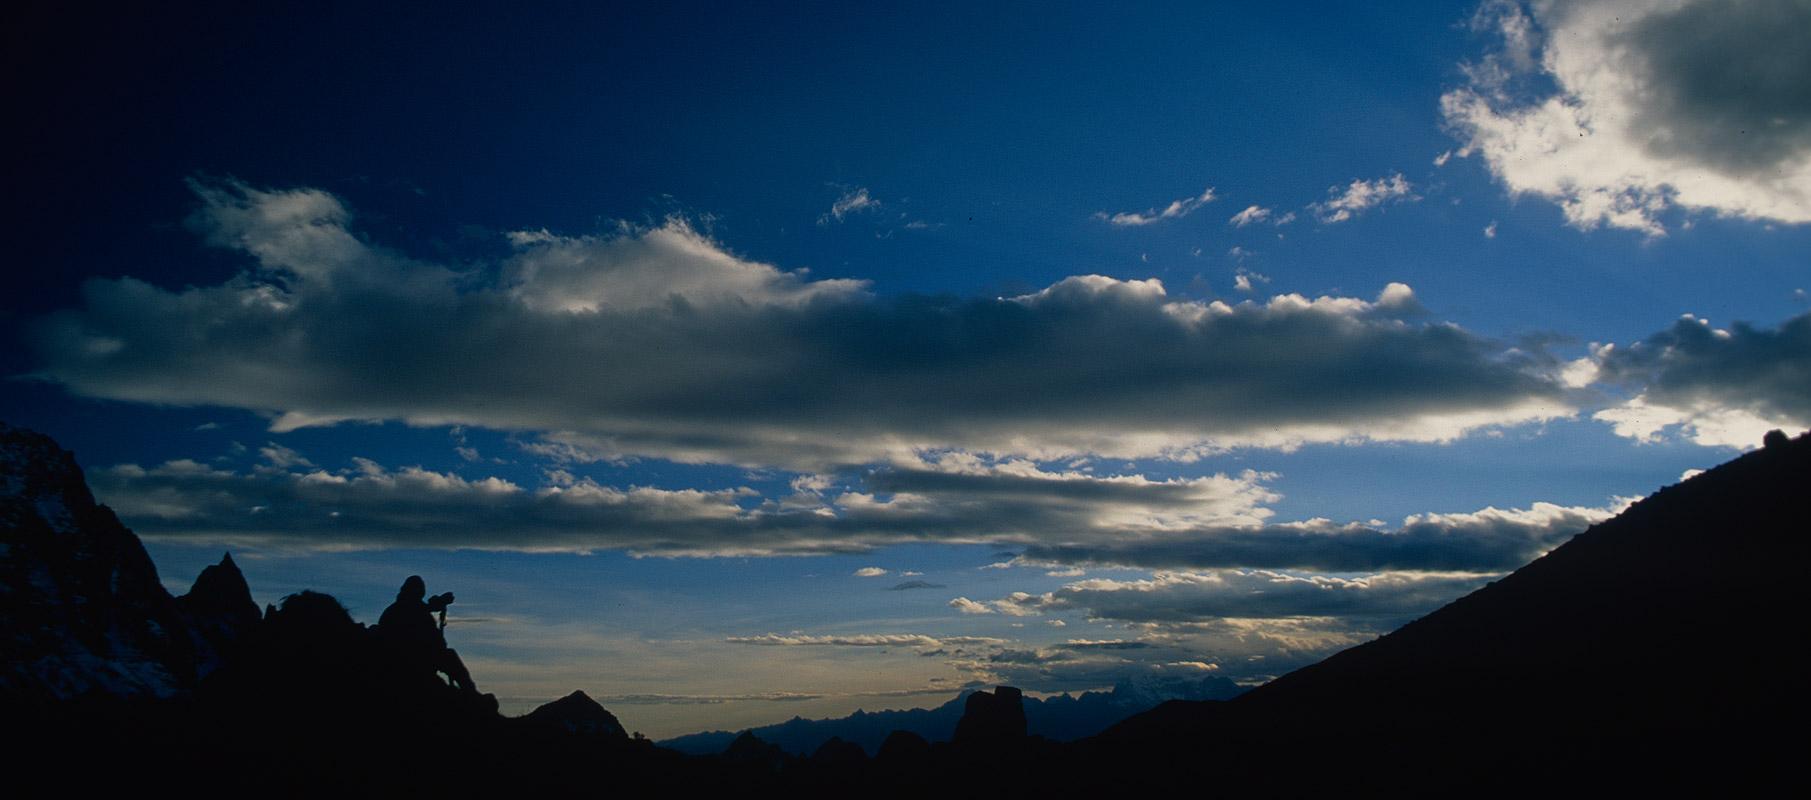 The high camp (4940m) below the western side of the Kanglakarchung or Karakachu LaNikon FM2, 28mm, Fuji Velvia